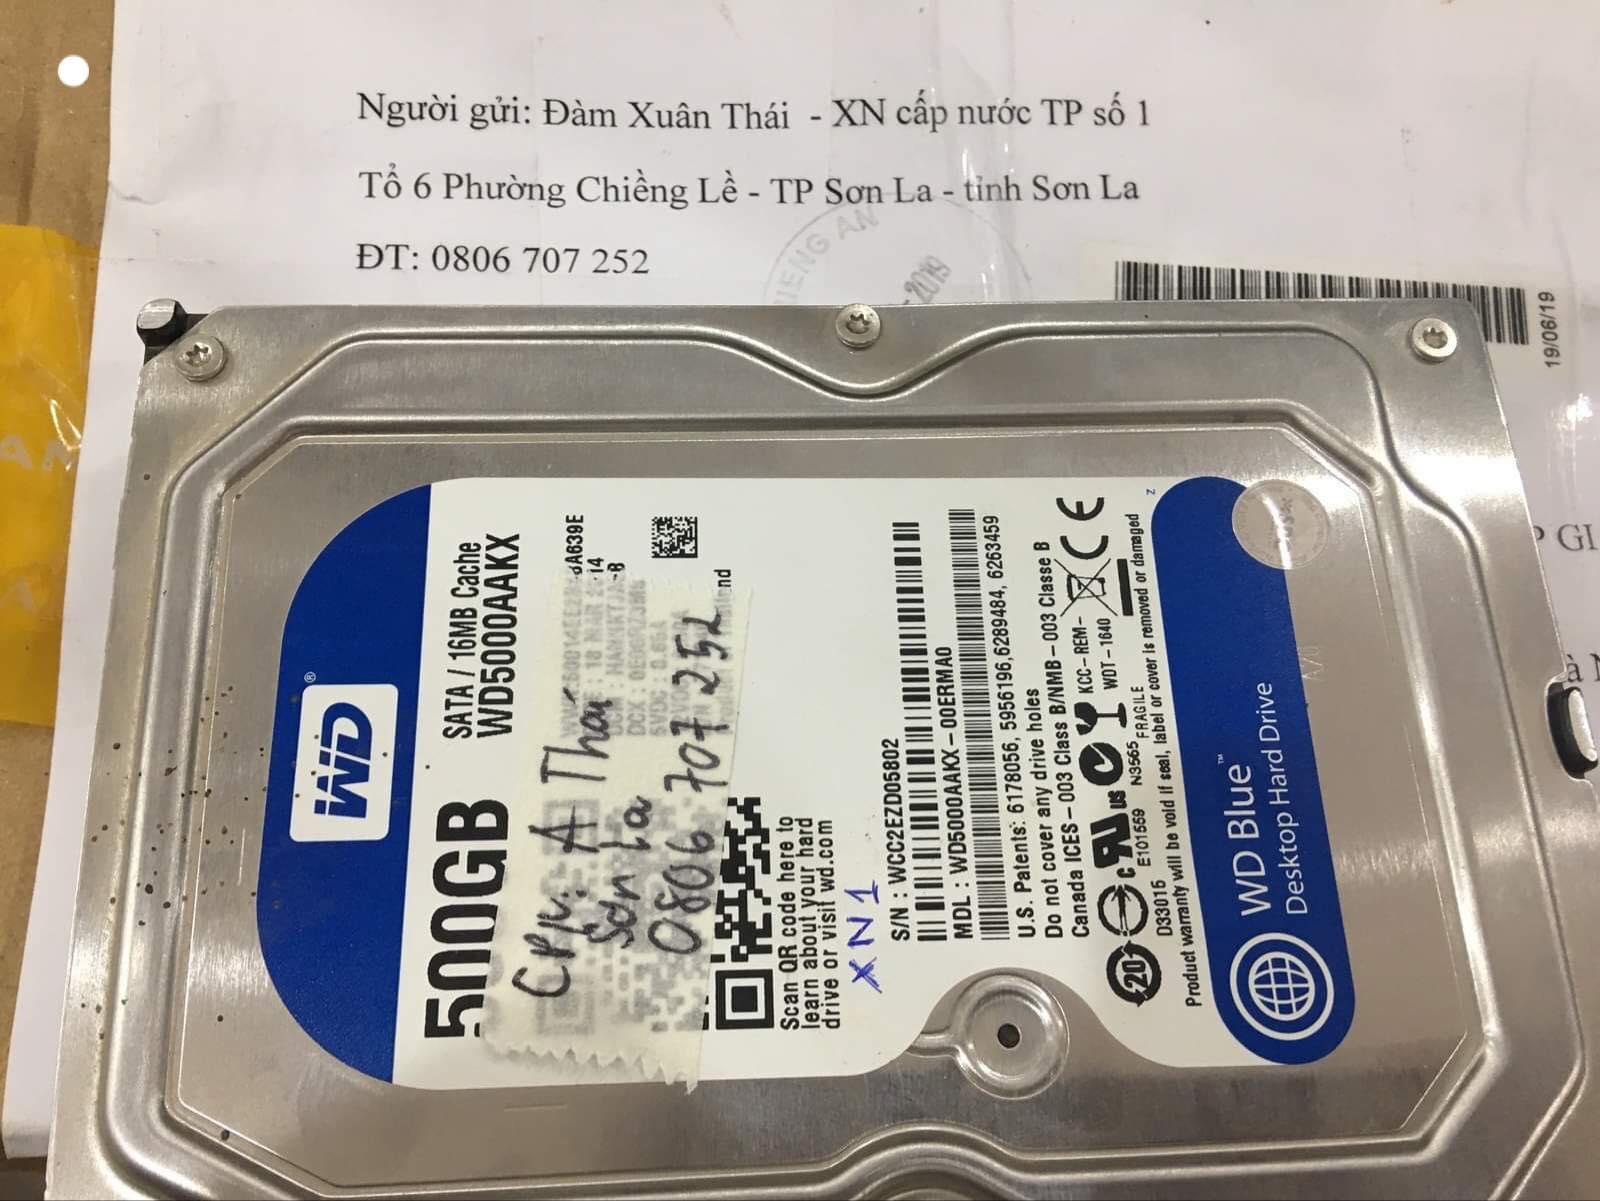 Lấy dữ liệu ổ cứng Western 500GB lỗi cơ tại Sơn La 22/11/2019 - cuumaytinh